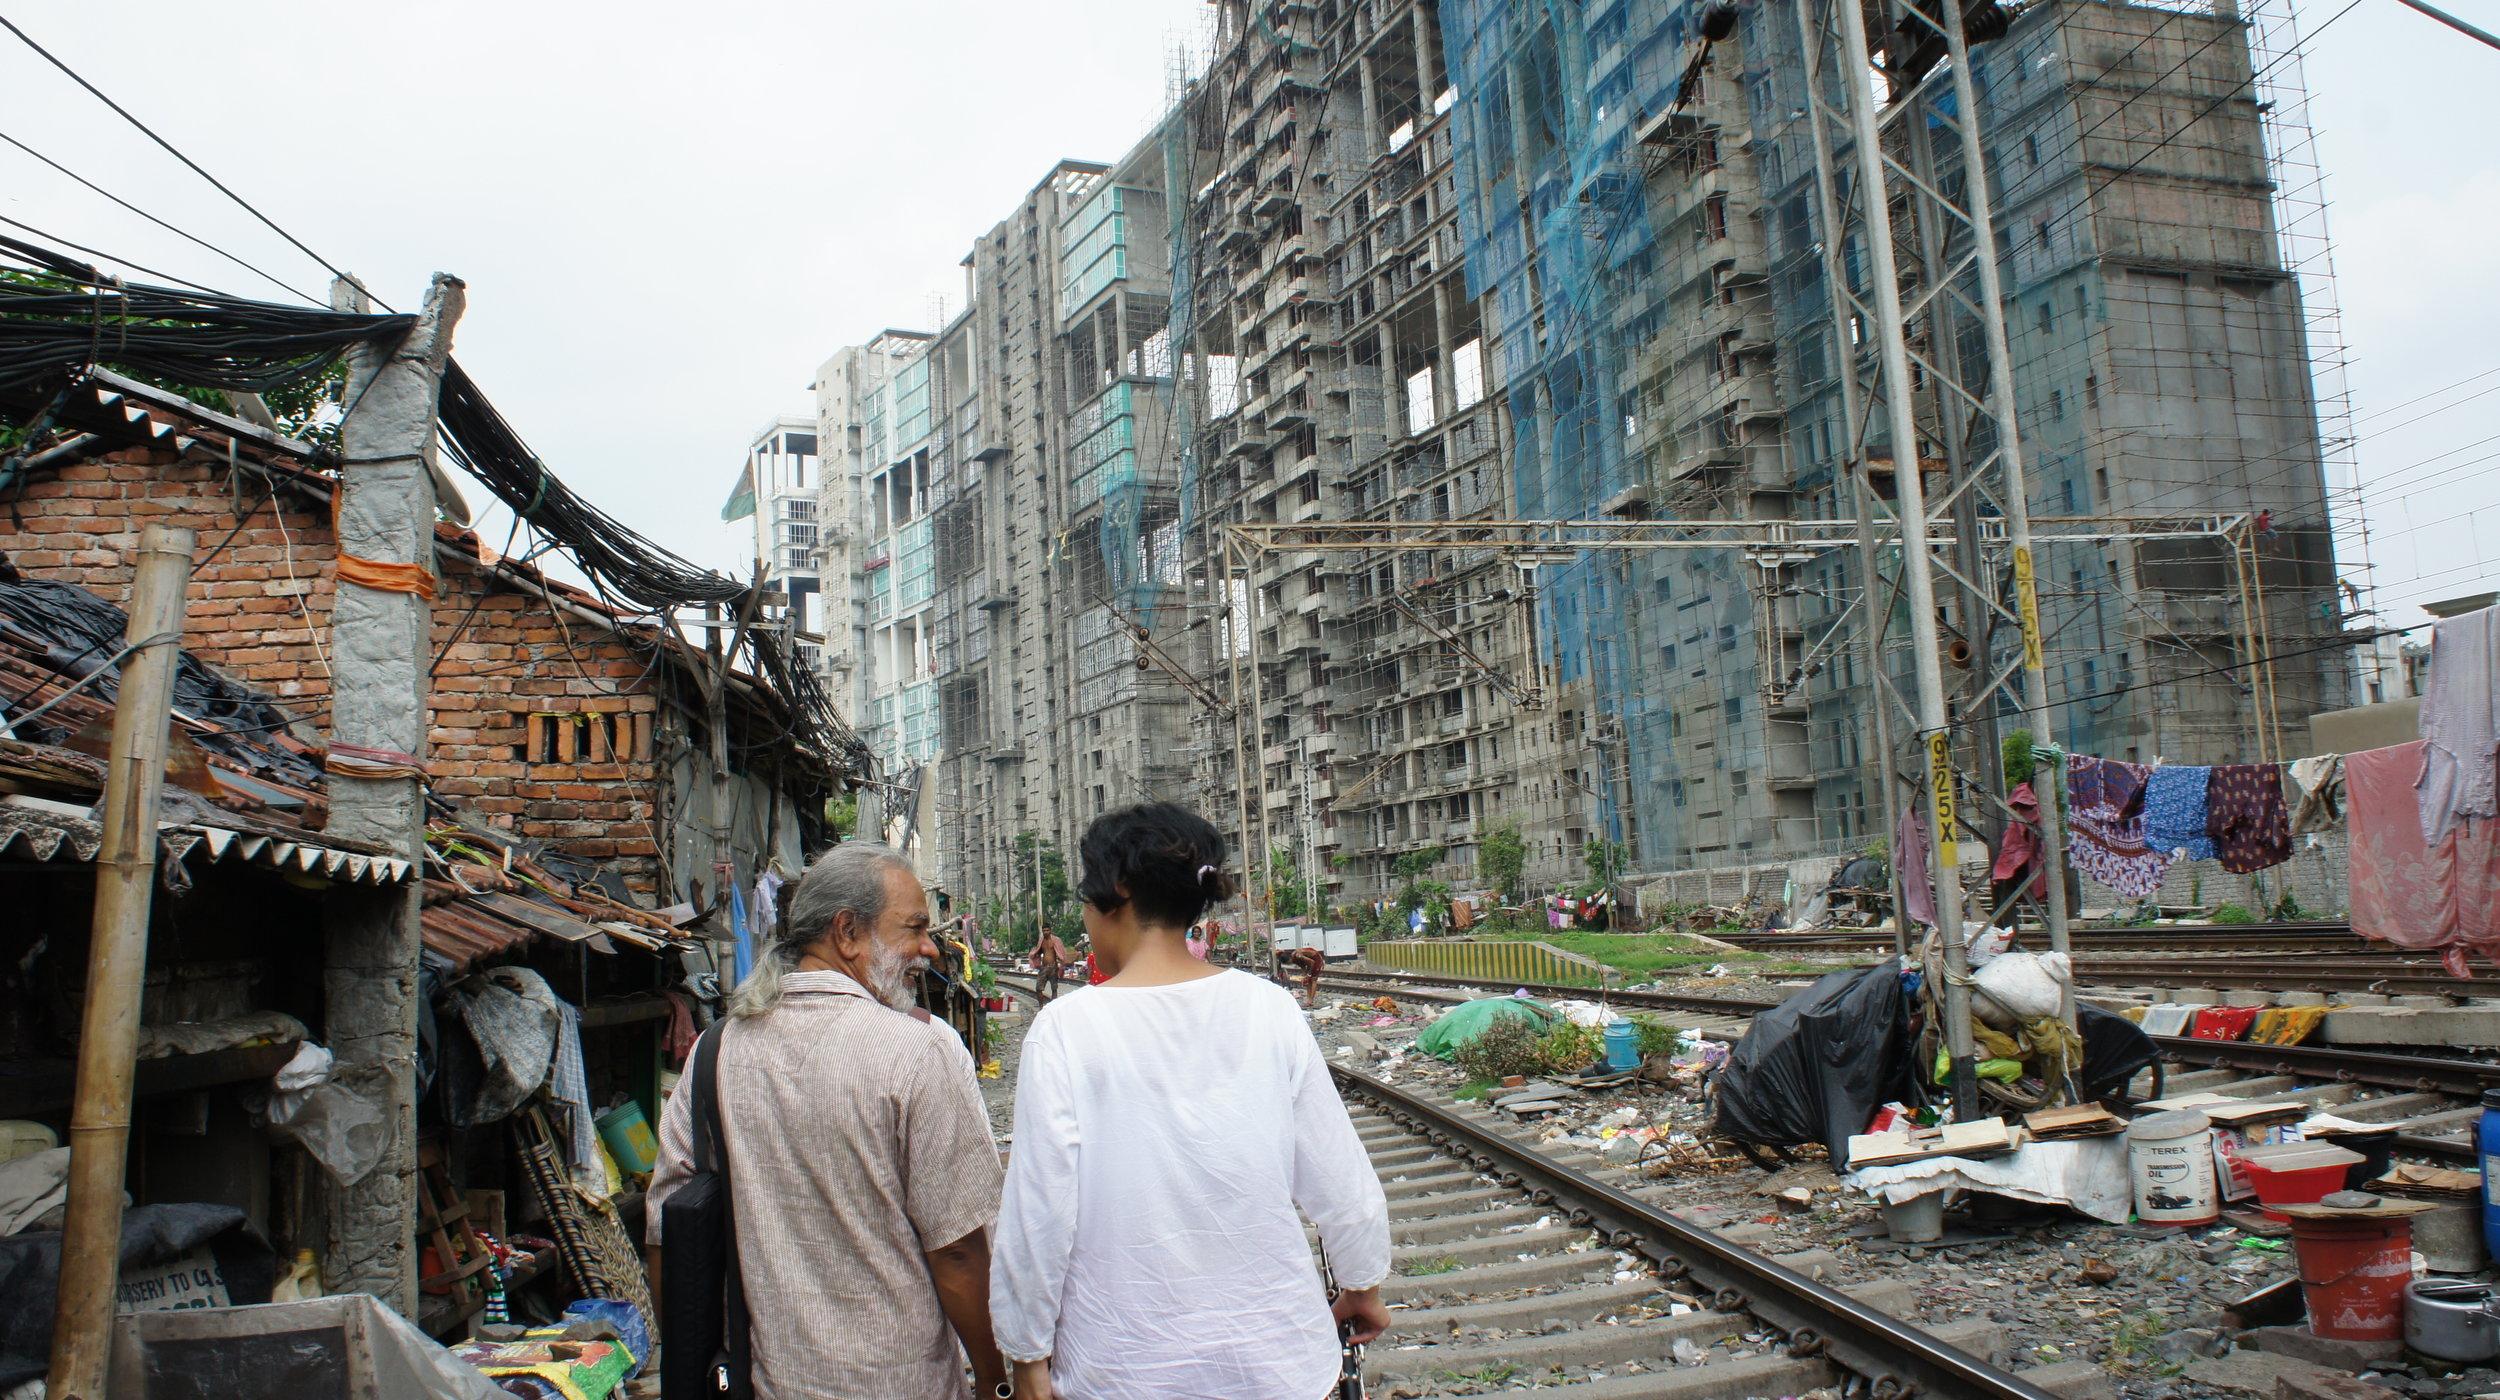 Bulada and Kiran Bhumber at New Alipore Station slum